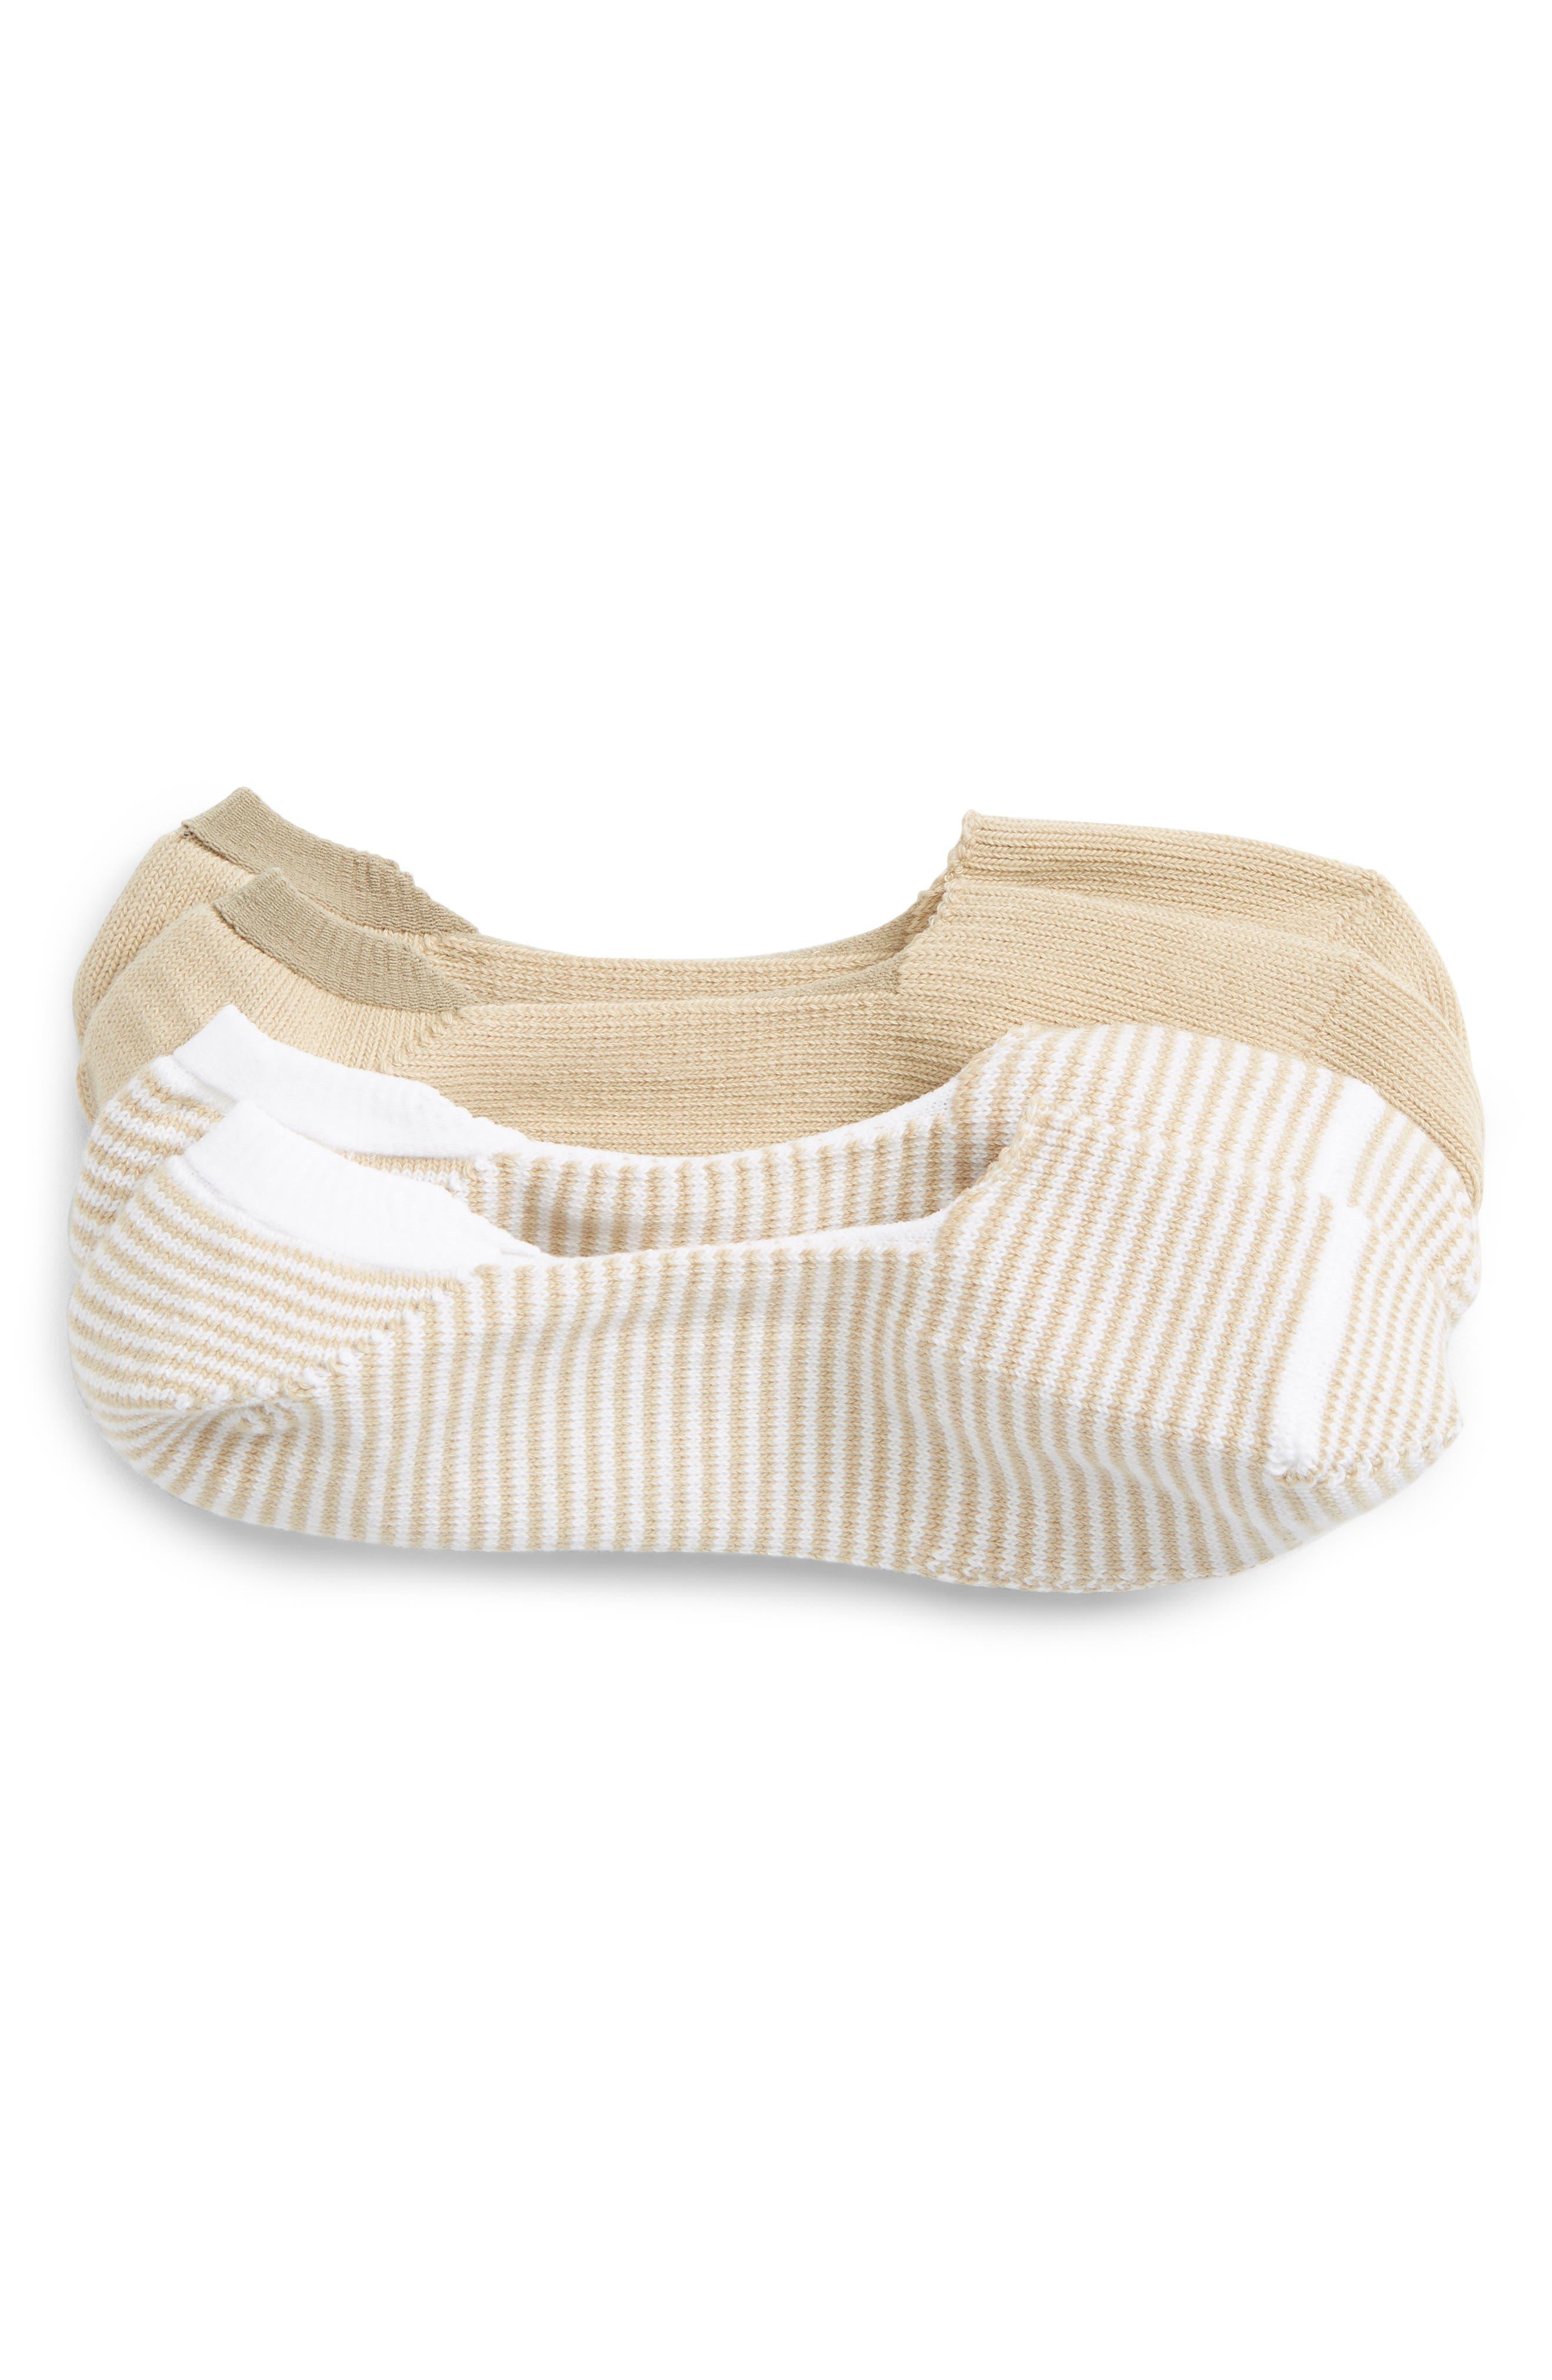 2-Pack Liner Socks,                         Main,                         color, Tan Nomad/ White